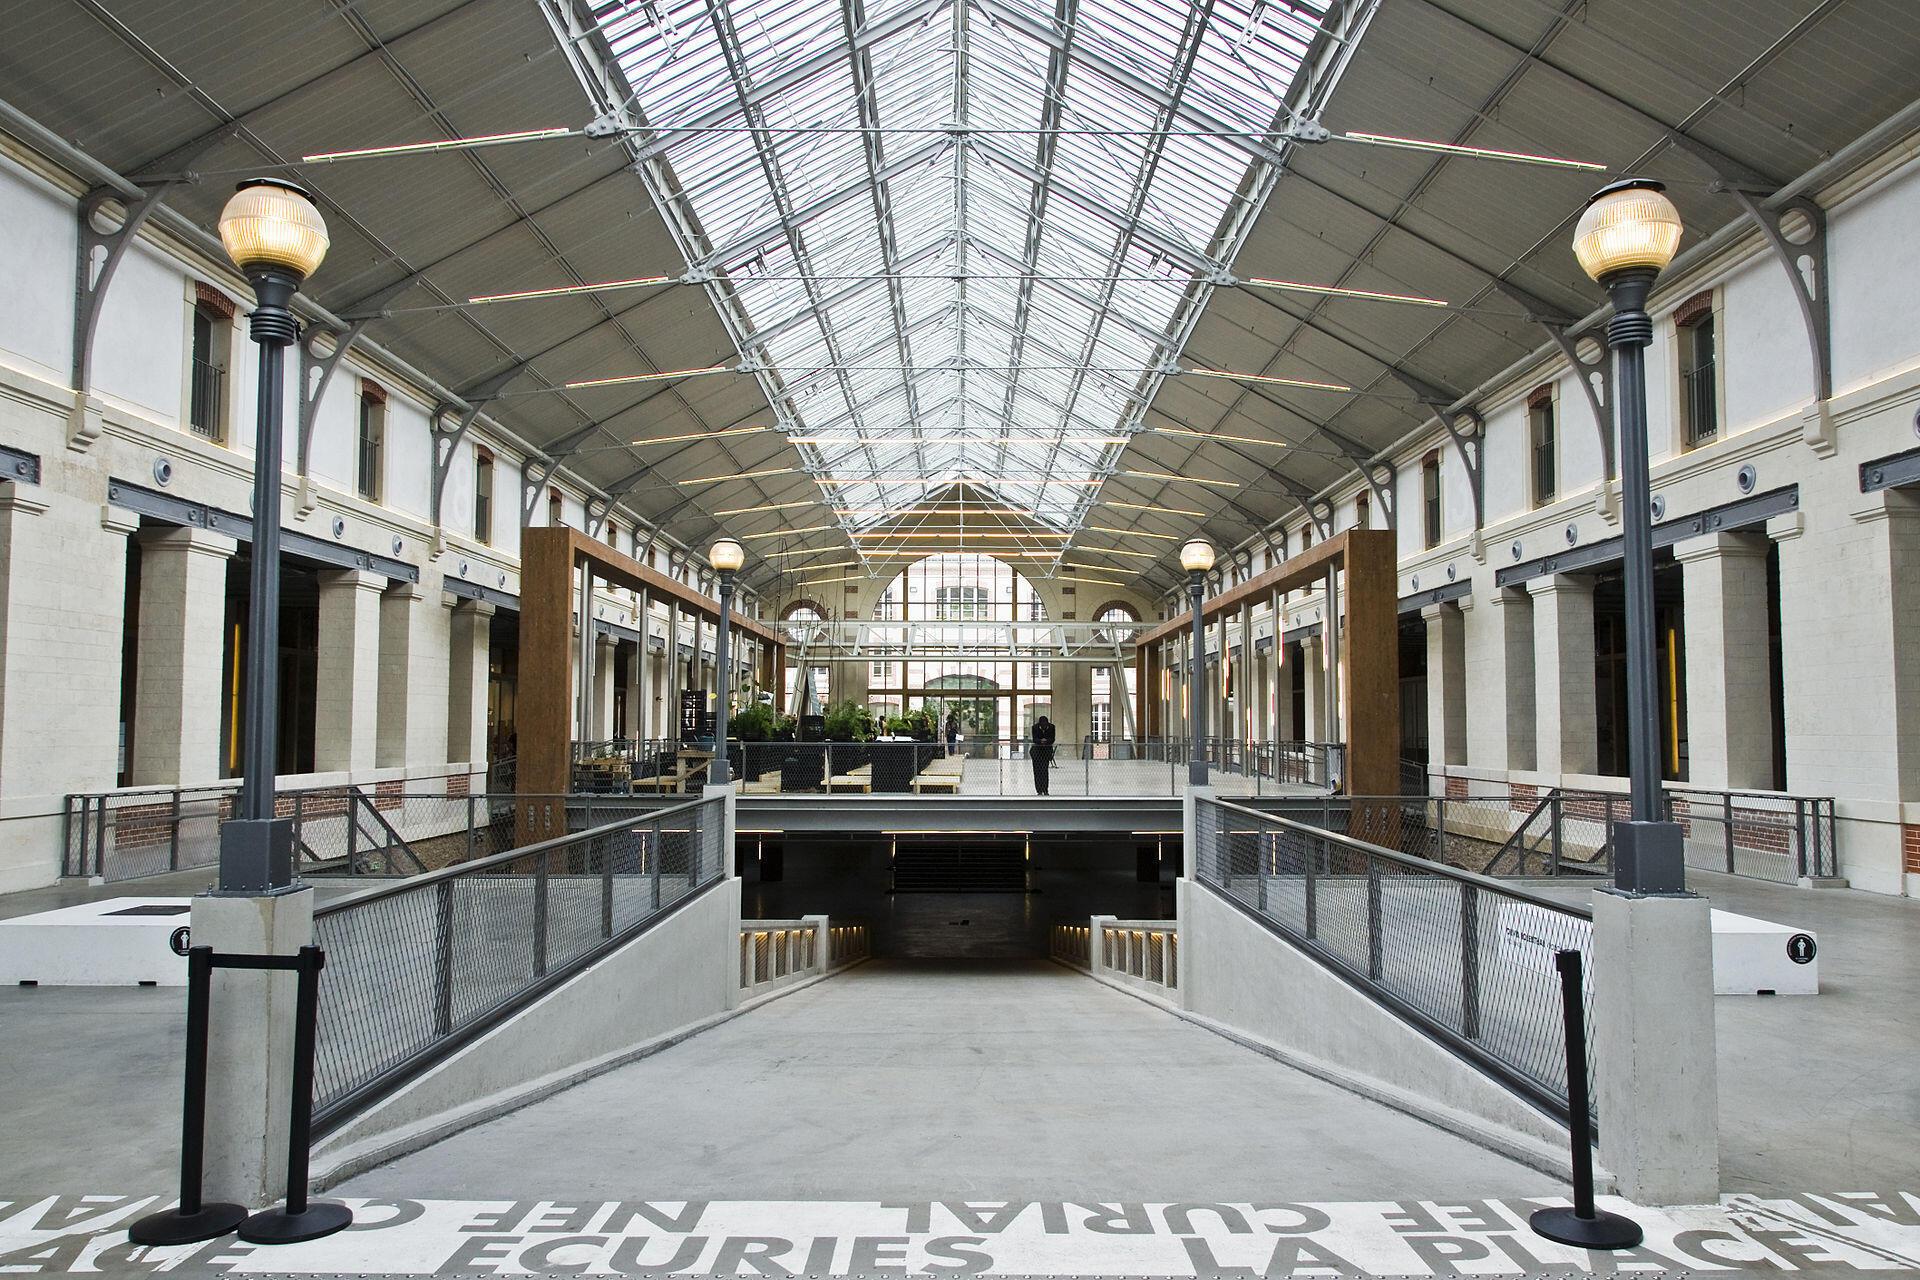 Le Centquatre contemporary arts centre in Paris